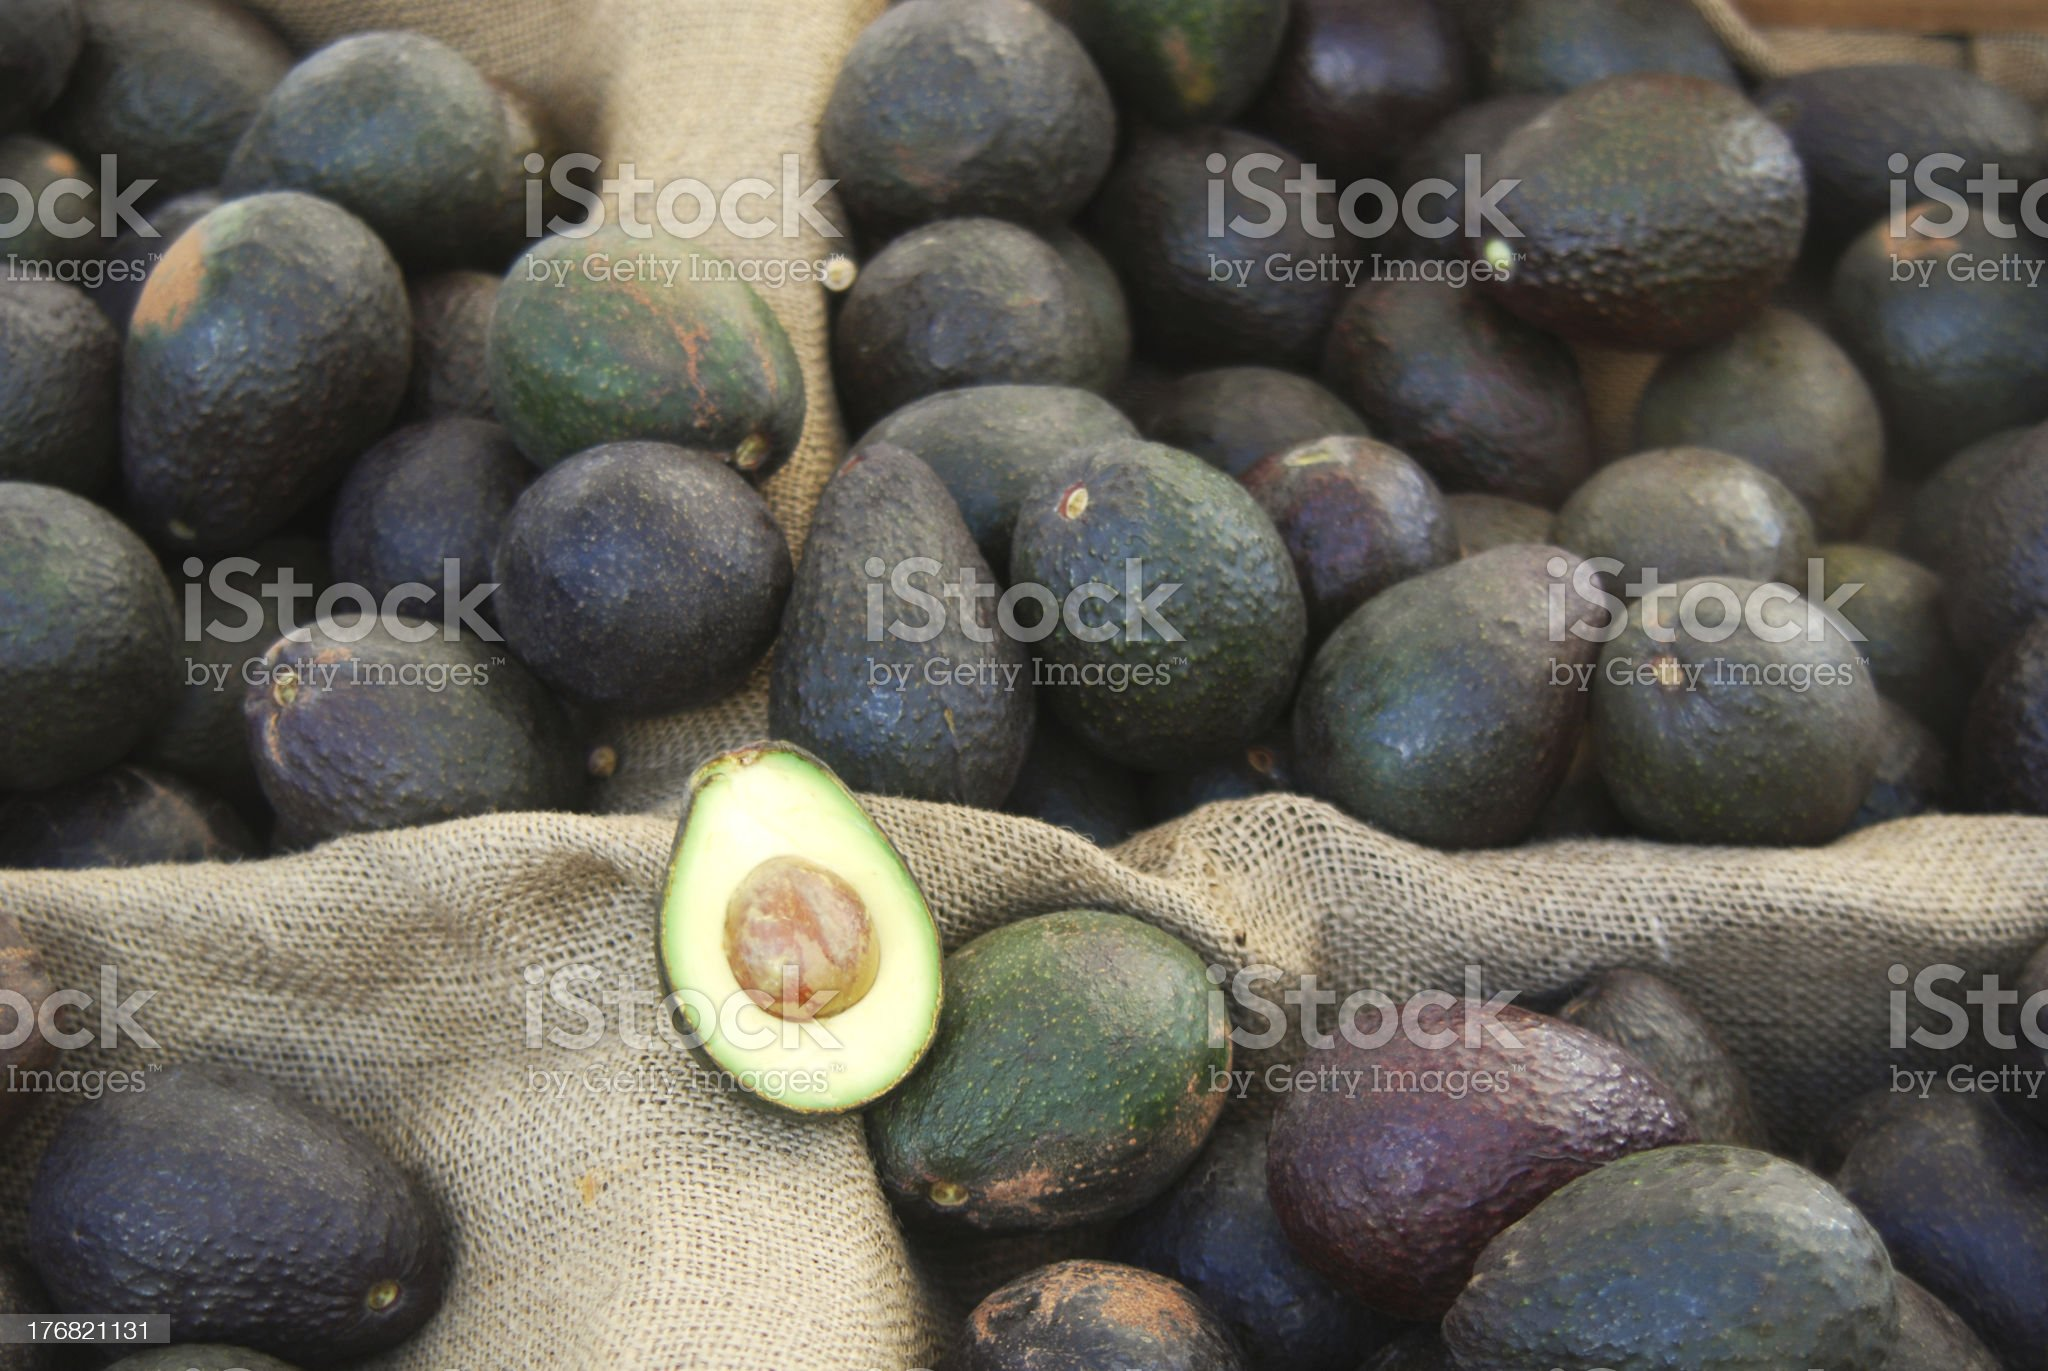 Farmer's Market Avocados royalty-free stock photo